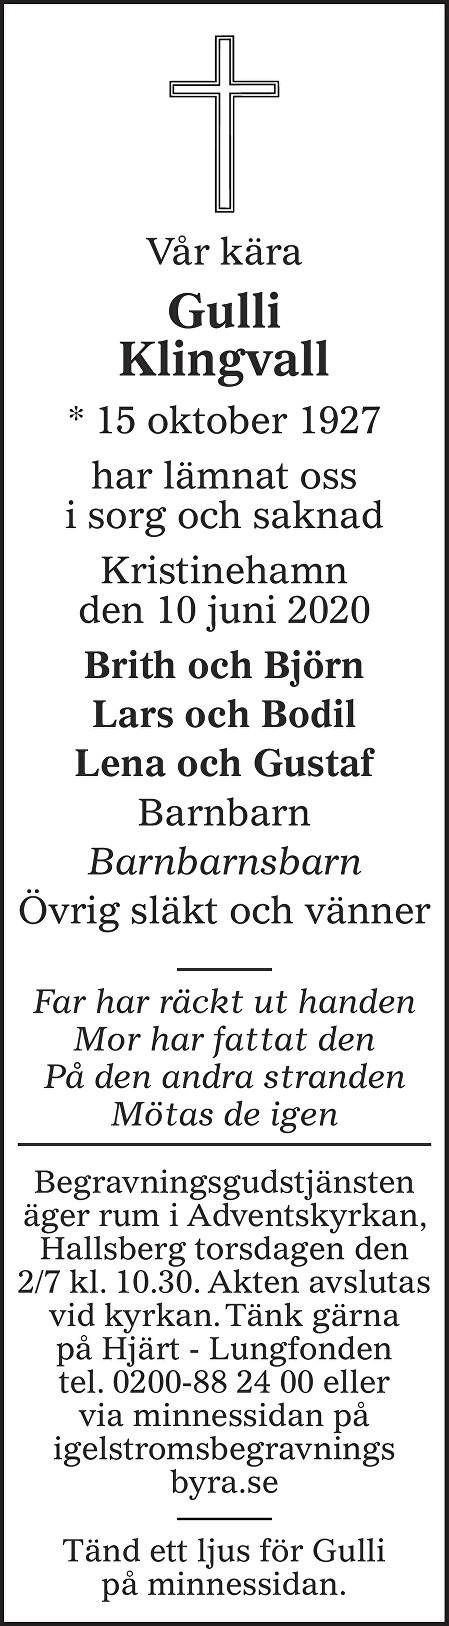 Gulli Klingvall Death notice